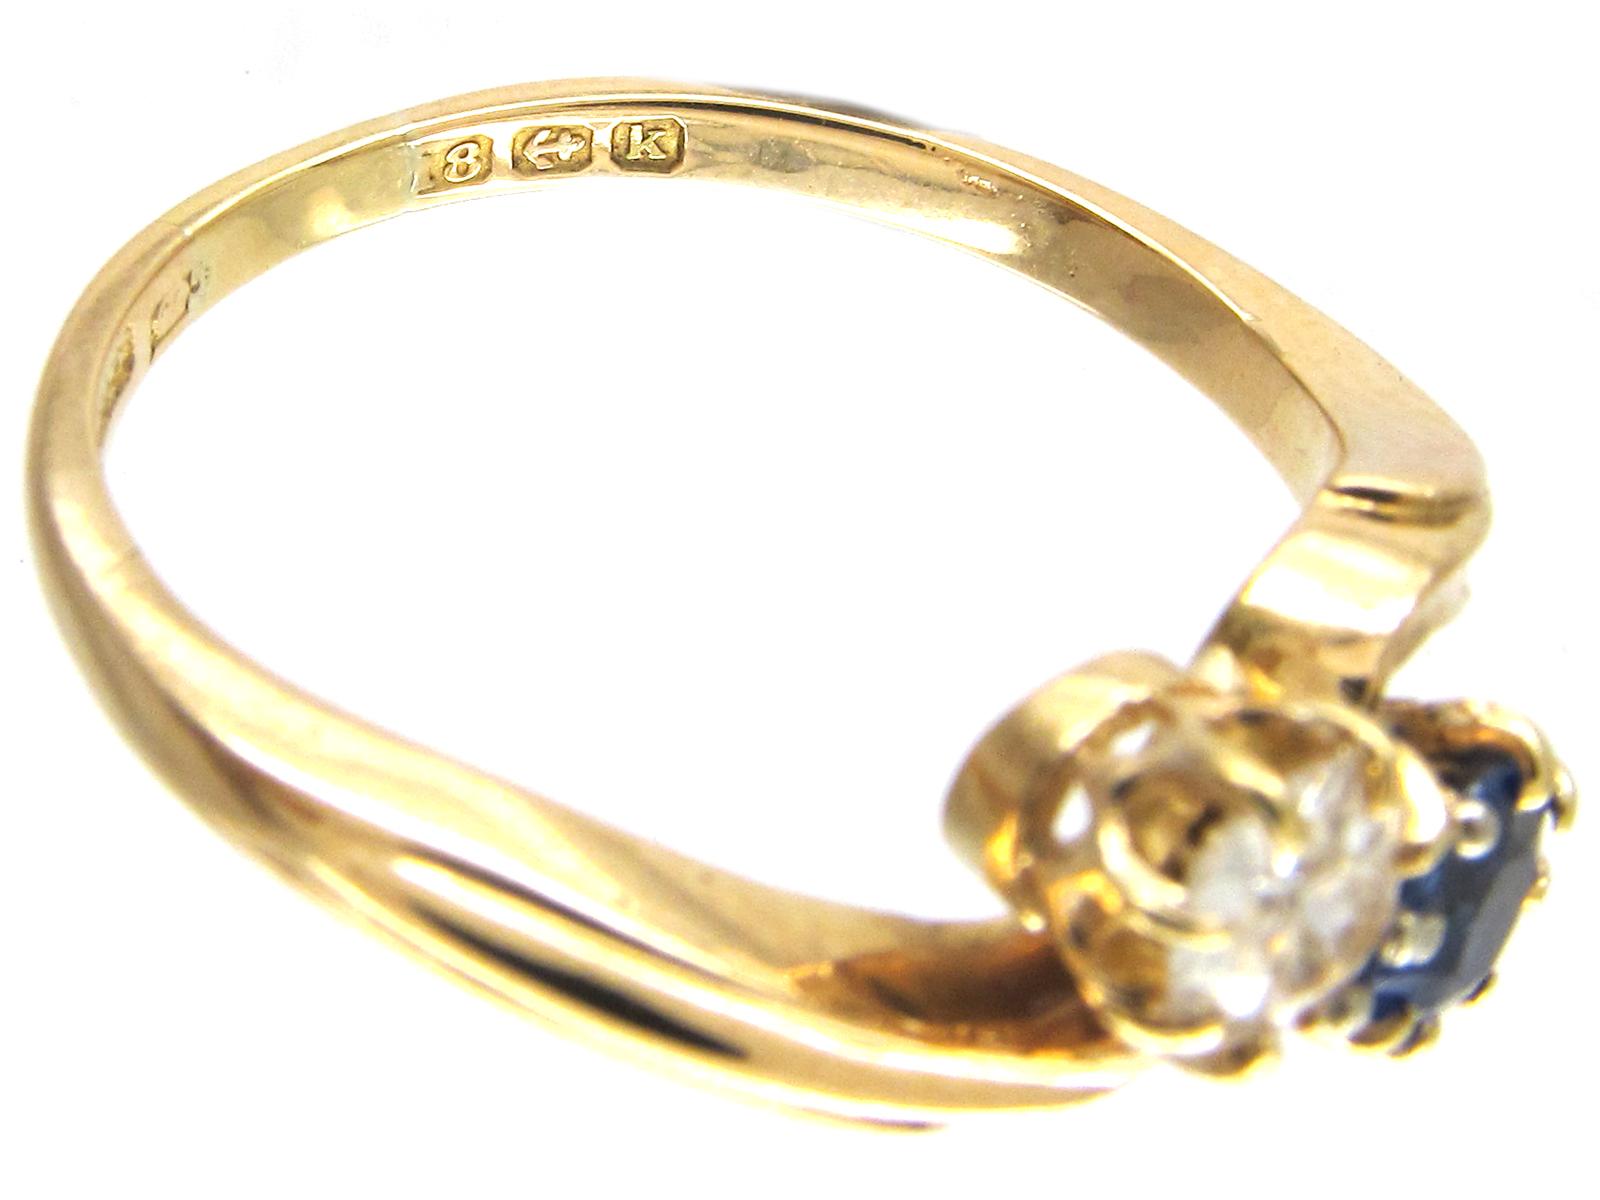 Edwardian Two Stone Diamond & Sapphire Crossover Ring